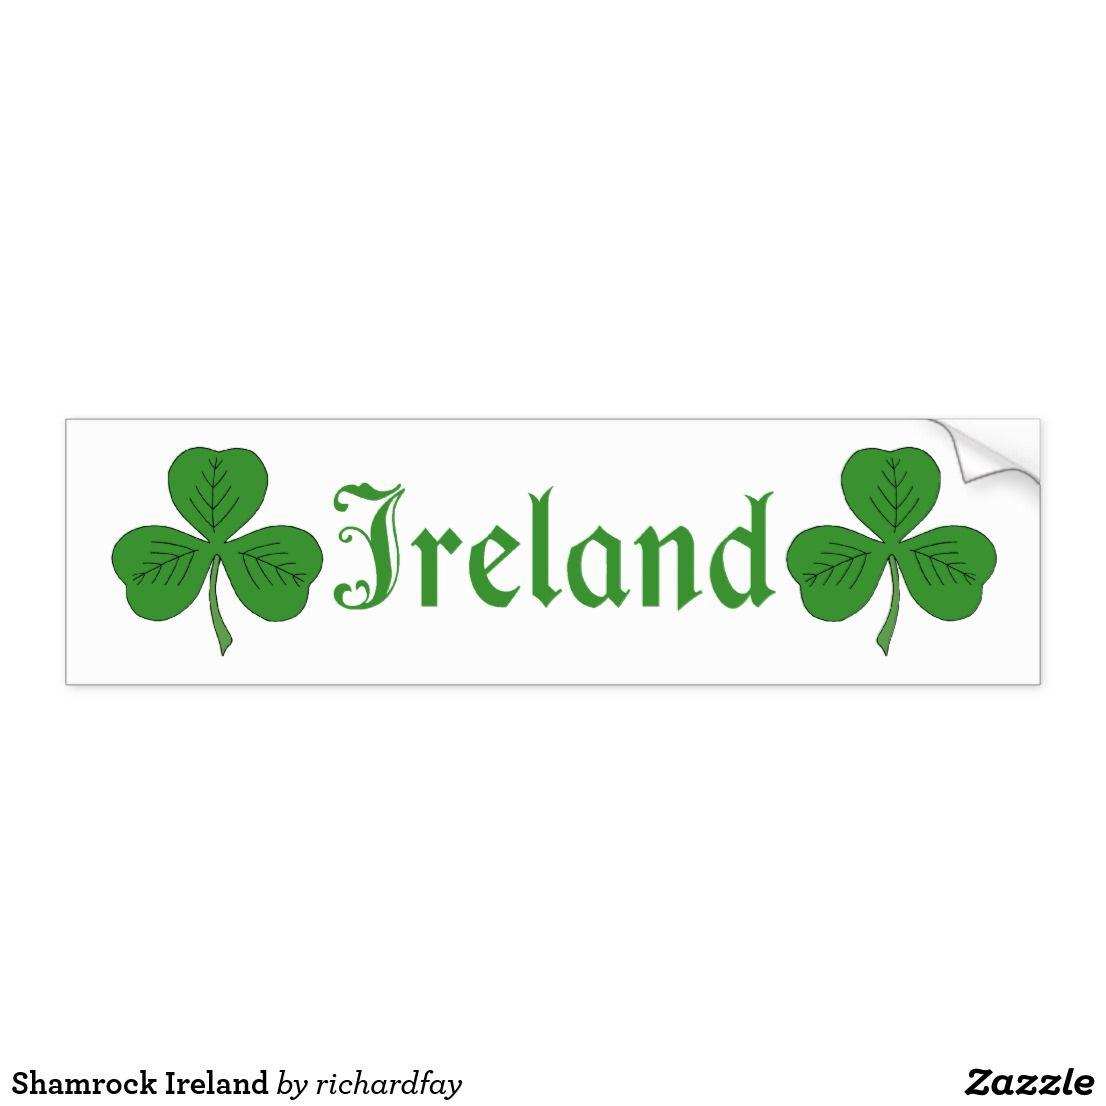 Shamrock Ireland Bumper Sticker Zazzle Com Bumper Stickers Shamrock Ireland Strong Adhesive [ 1106 x 1106 Pixel ]